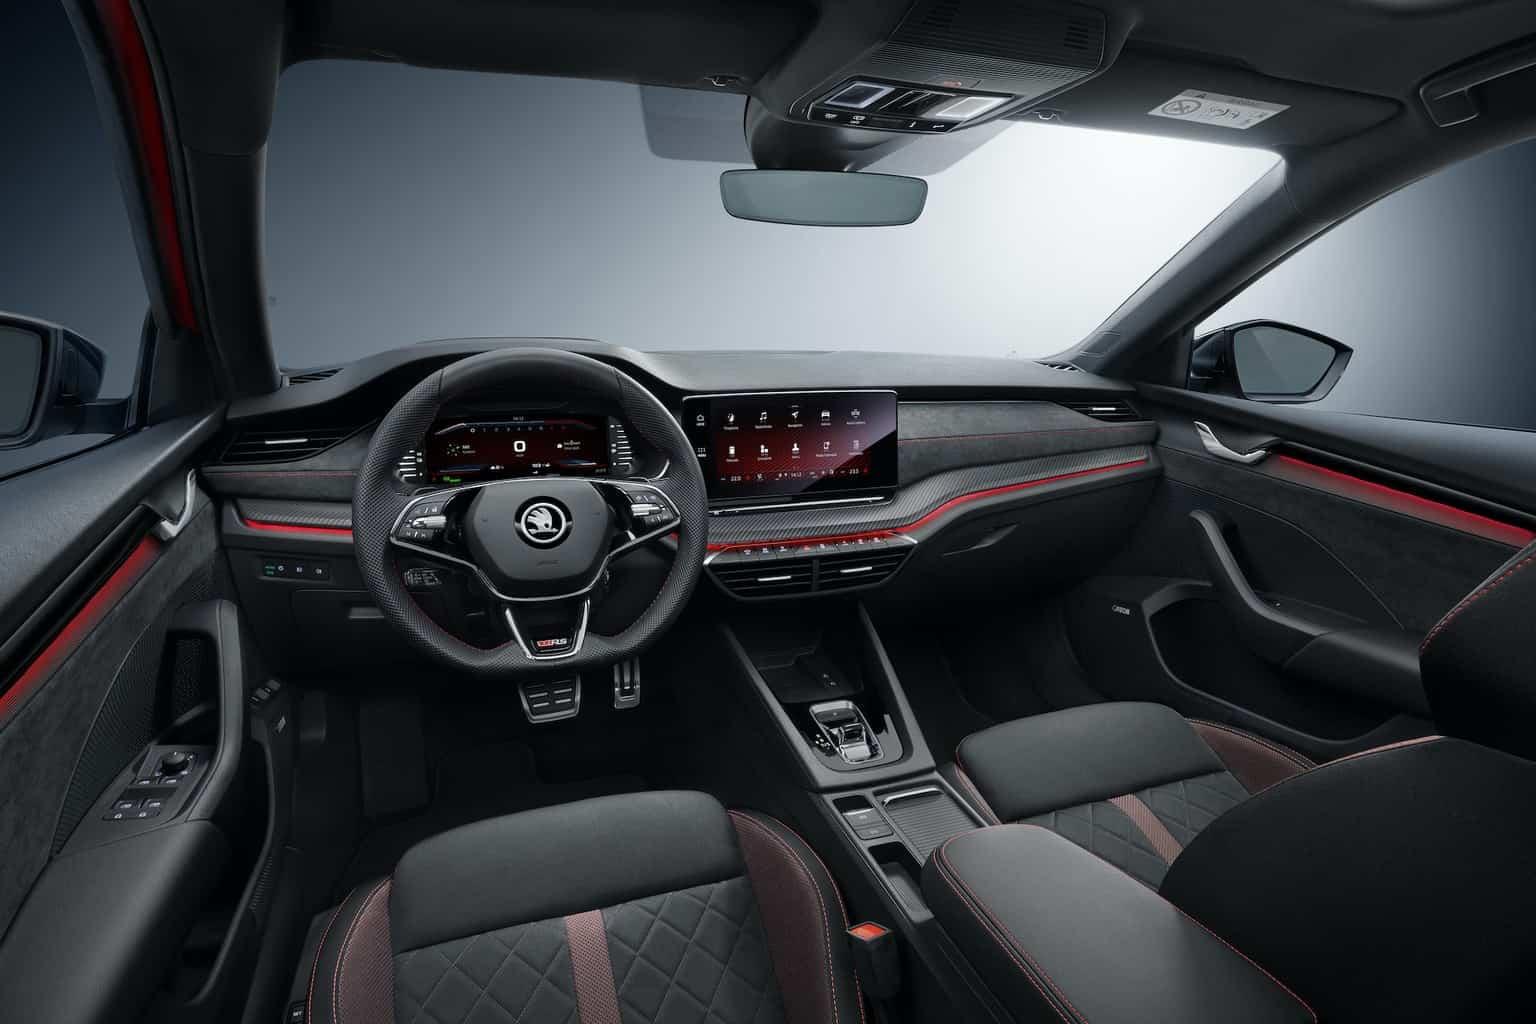 Skoda Octavia RS iV Plug-in-Hybrid Cockpit